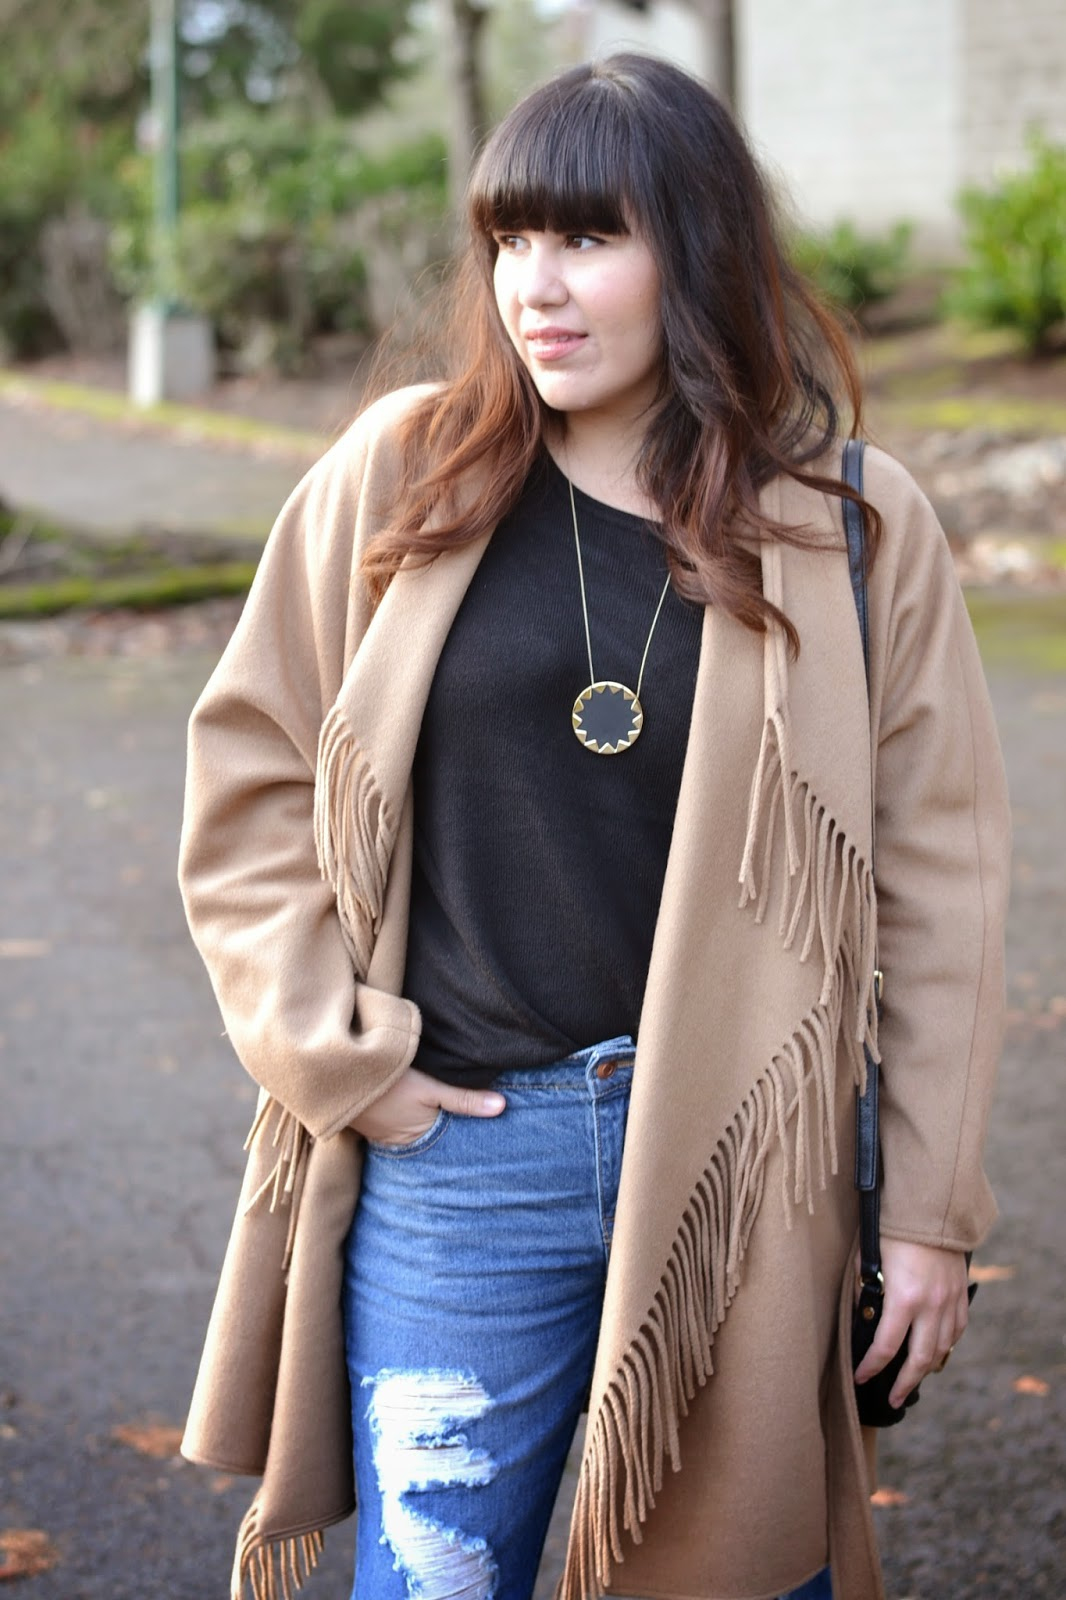 H&m Fringe Coat Style For The